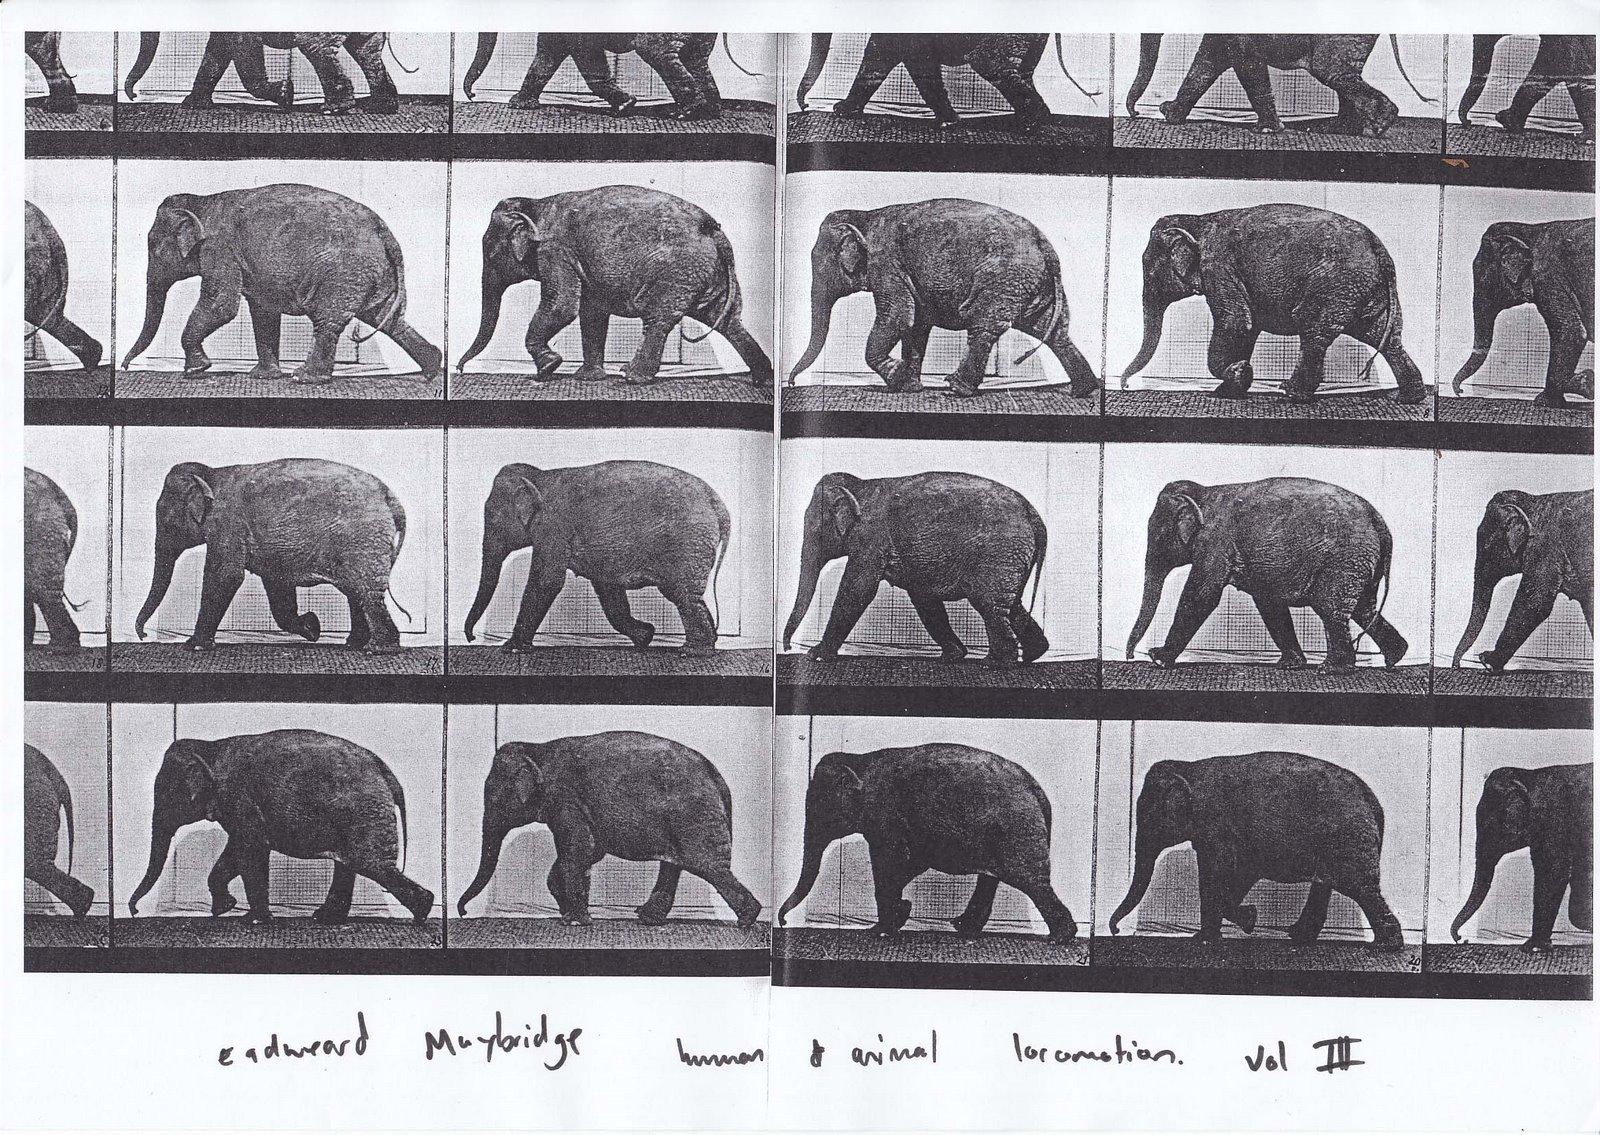 elephant | Sauropod Vertebra Picture of the Week